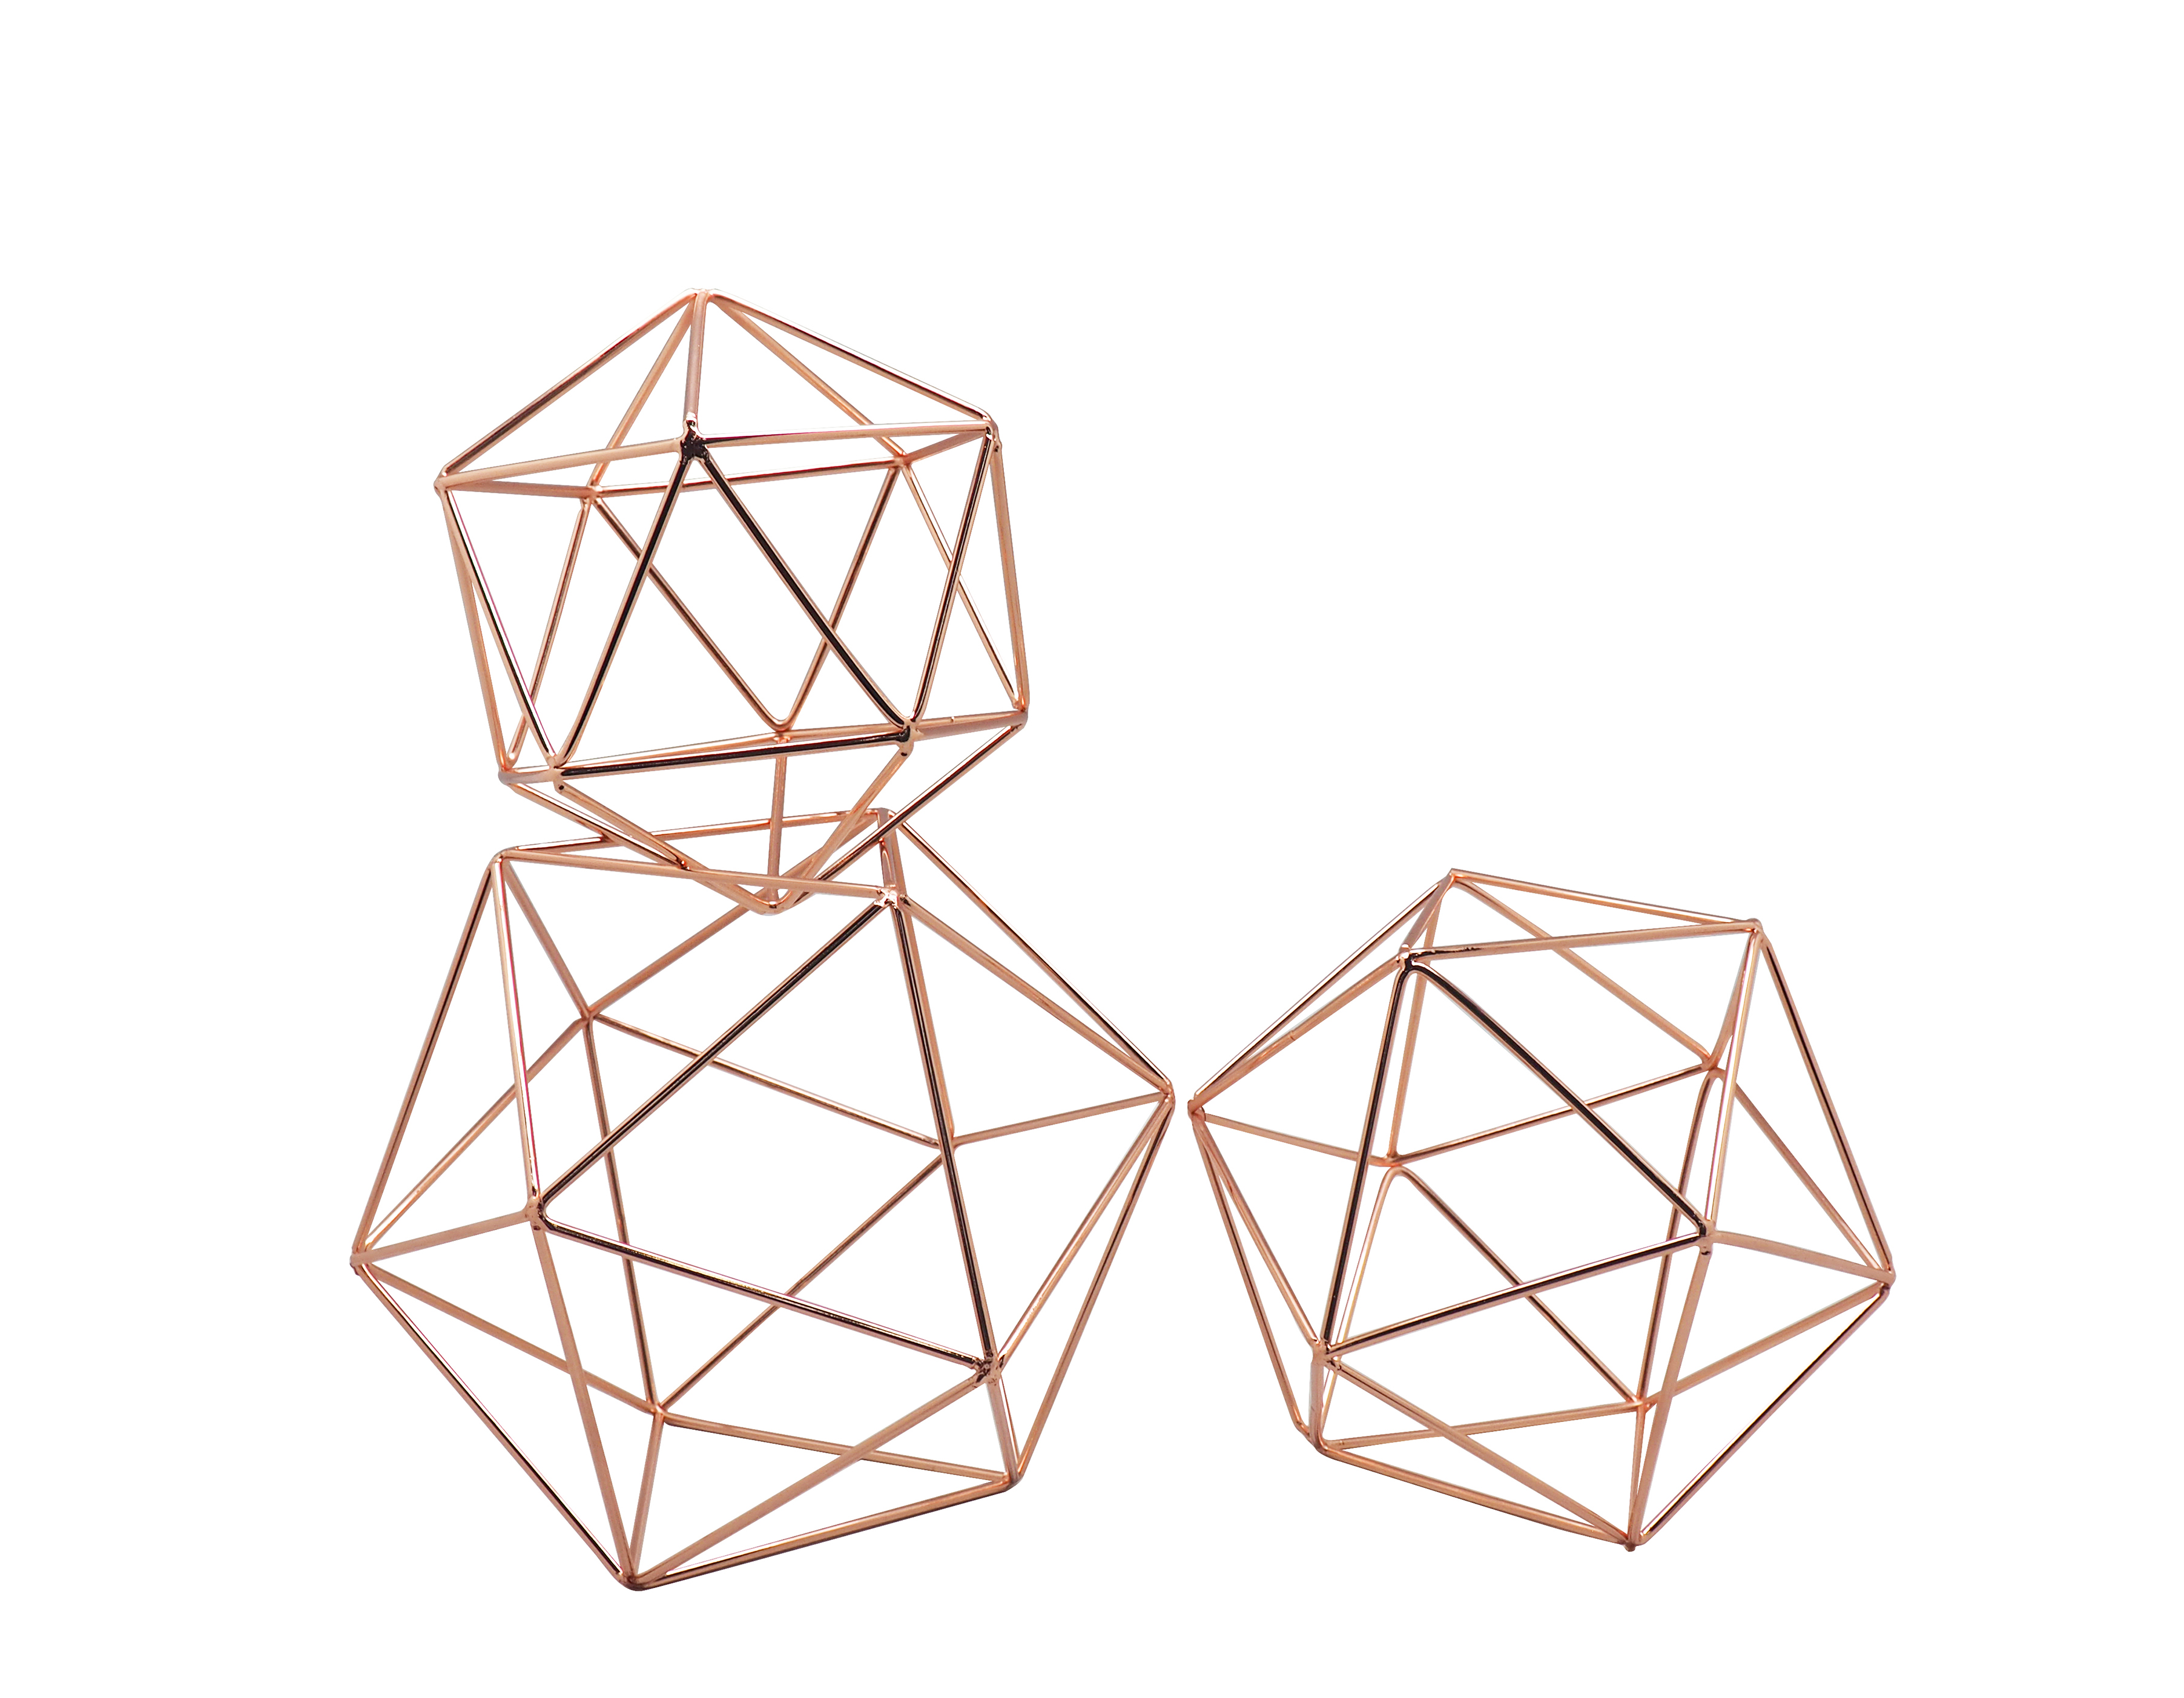 Koyal Wholesale Rose Gold Geometric Decor Shapes Set Of 3 Himmelis